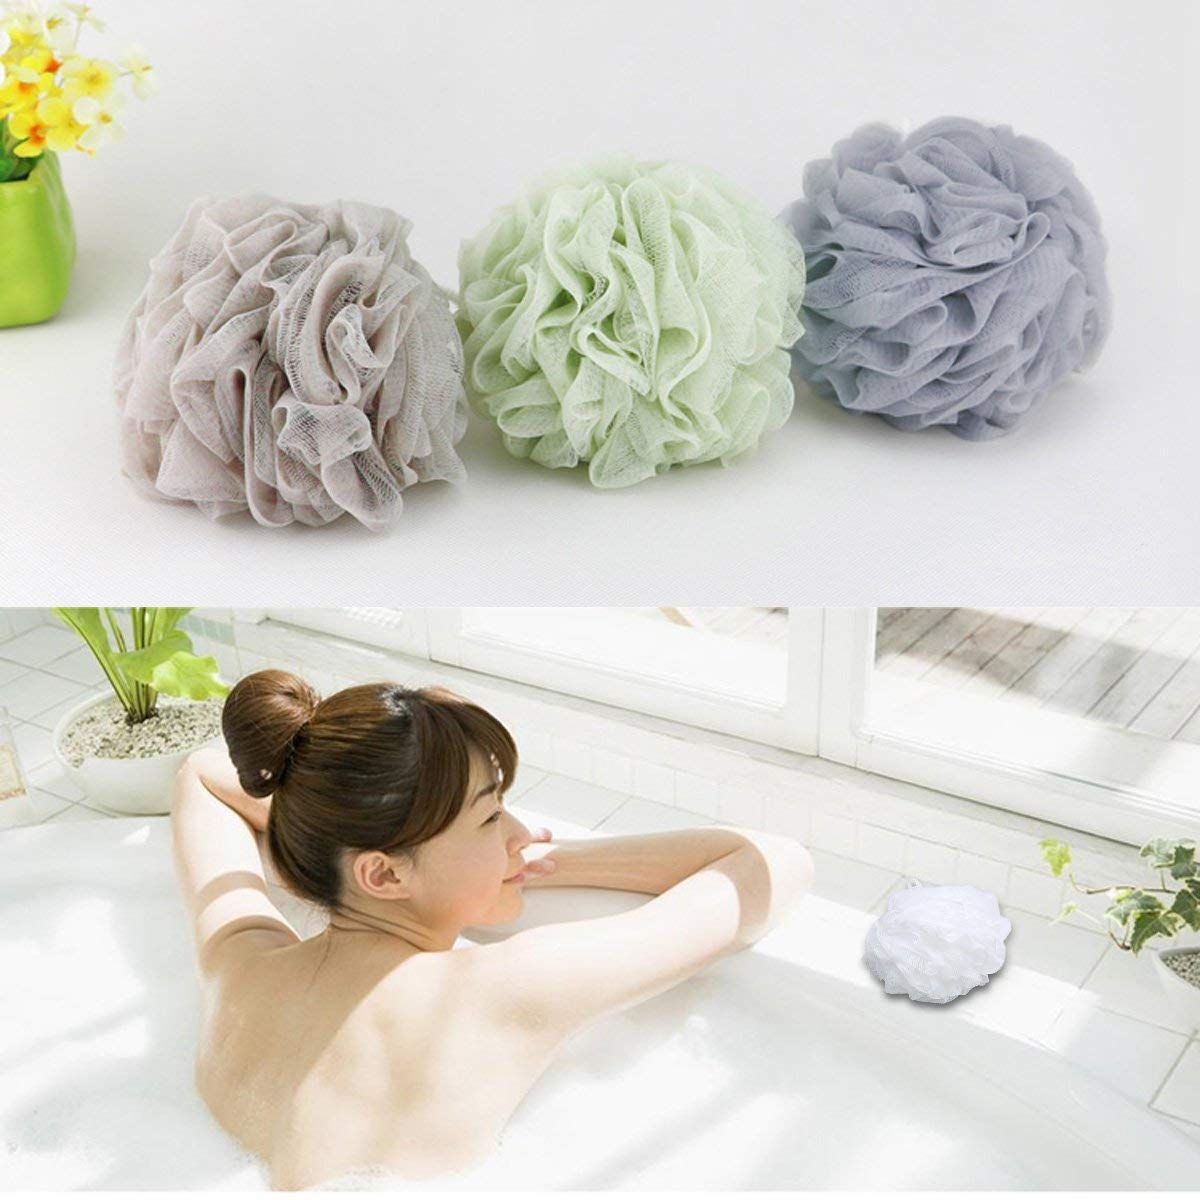 Bignay Bath Shower Sponge Loofahs Ball Scrubber for Men and Women Multi Color